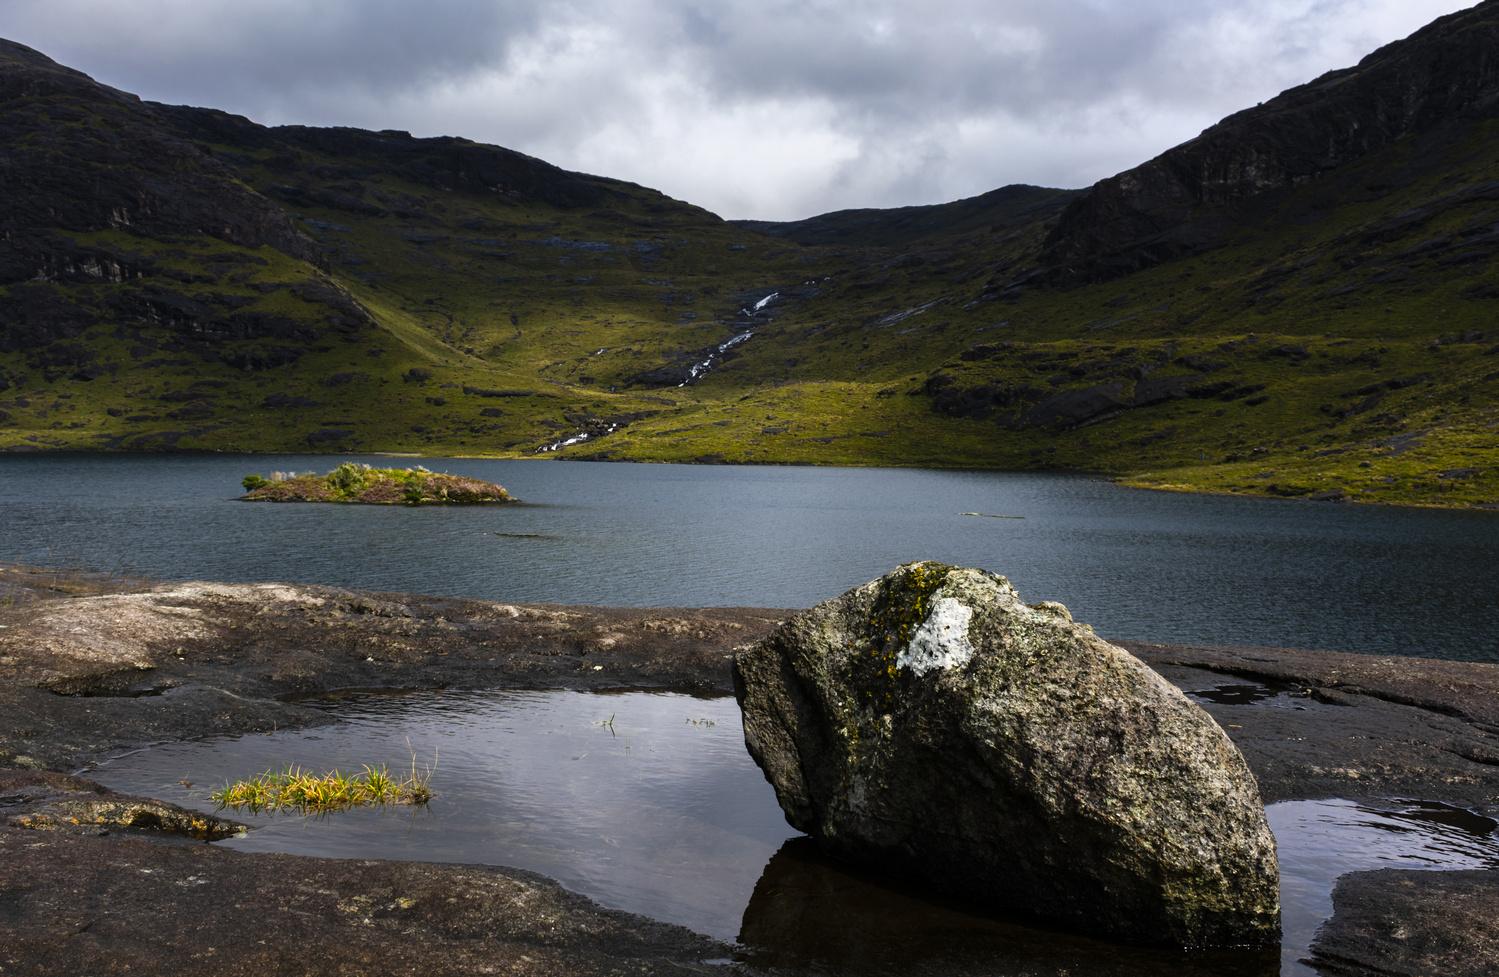 Loch Coruisk by Dániel Spergel